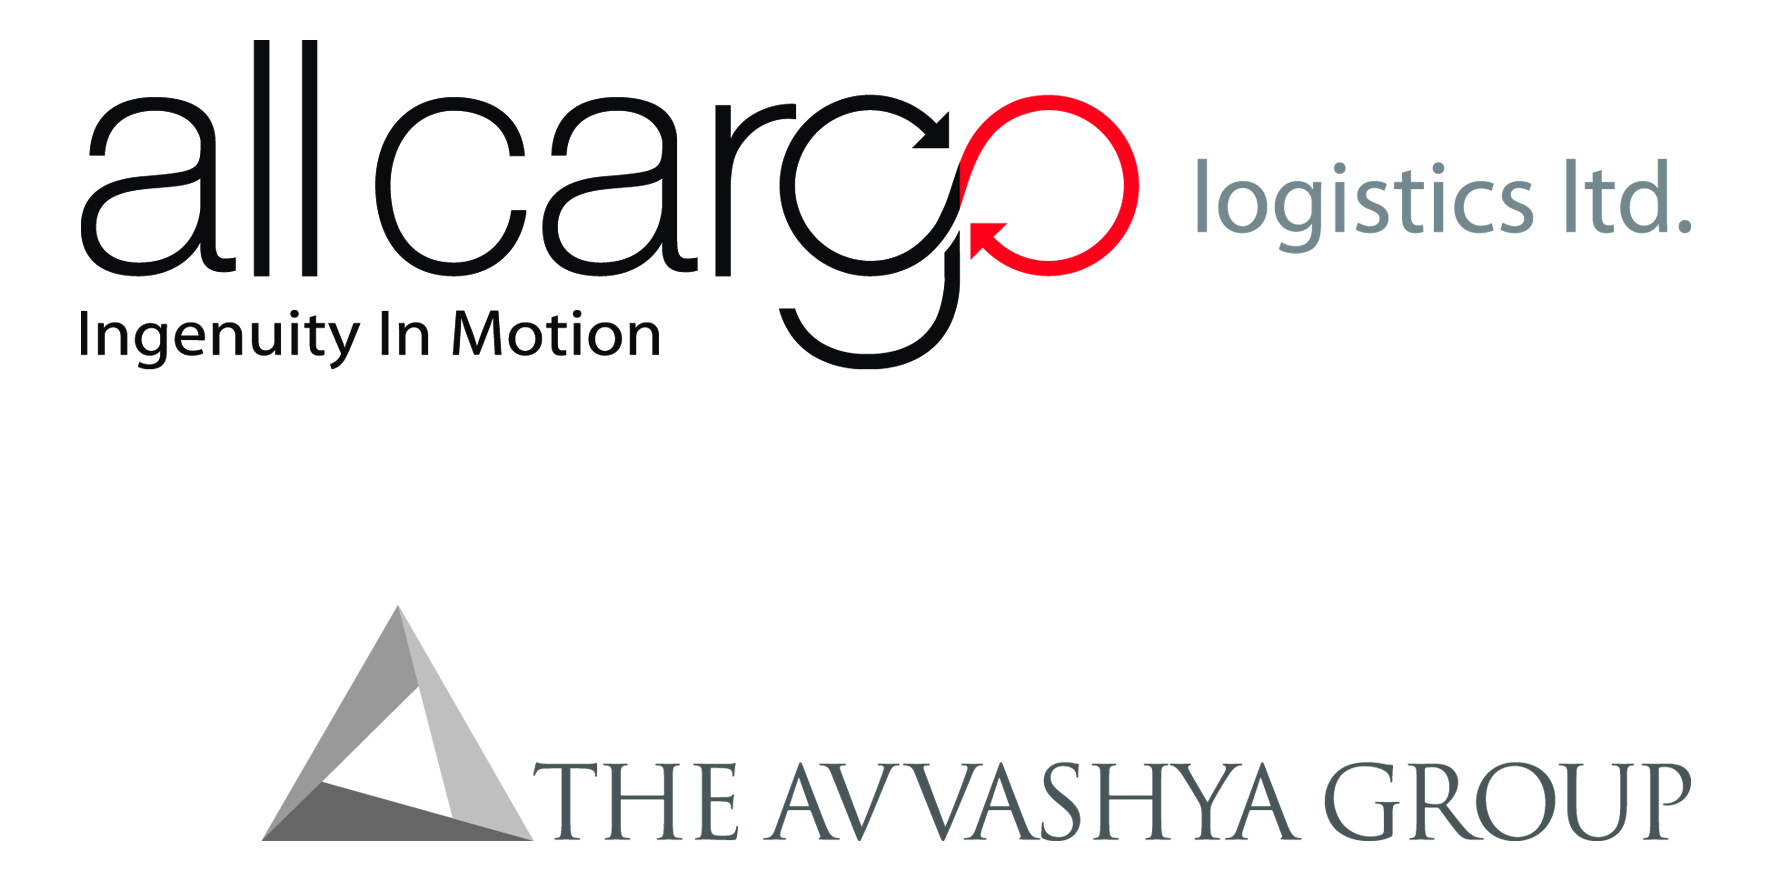 allcargo logistics with Avvashya-highres.jpg